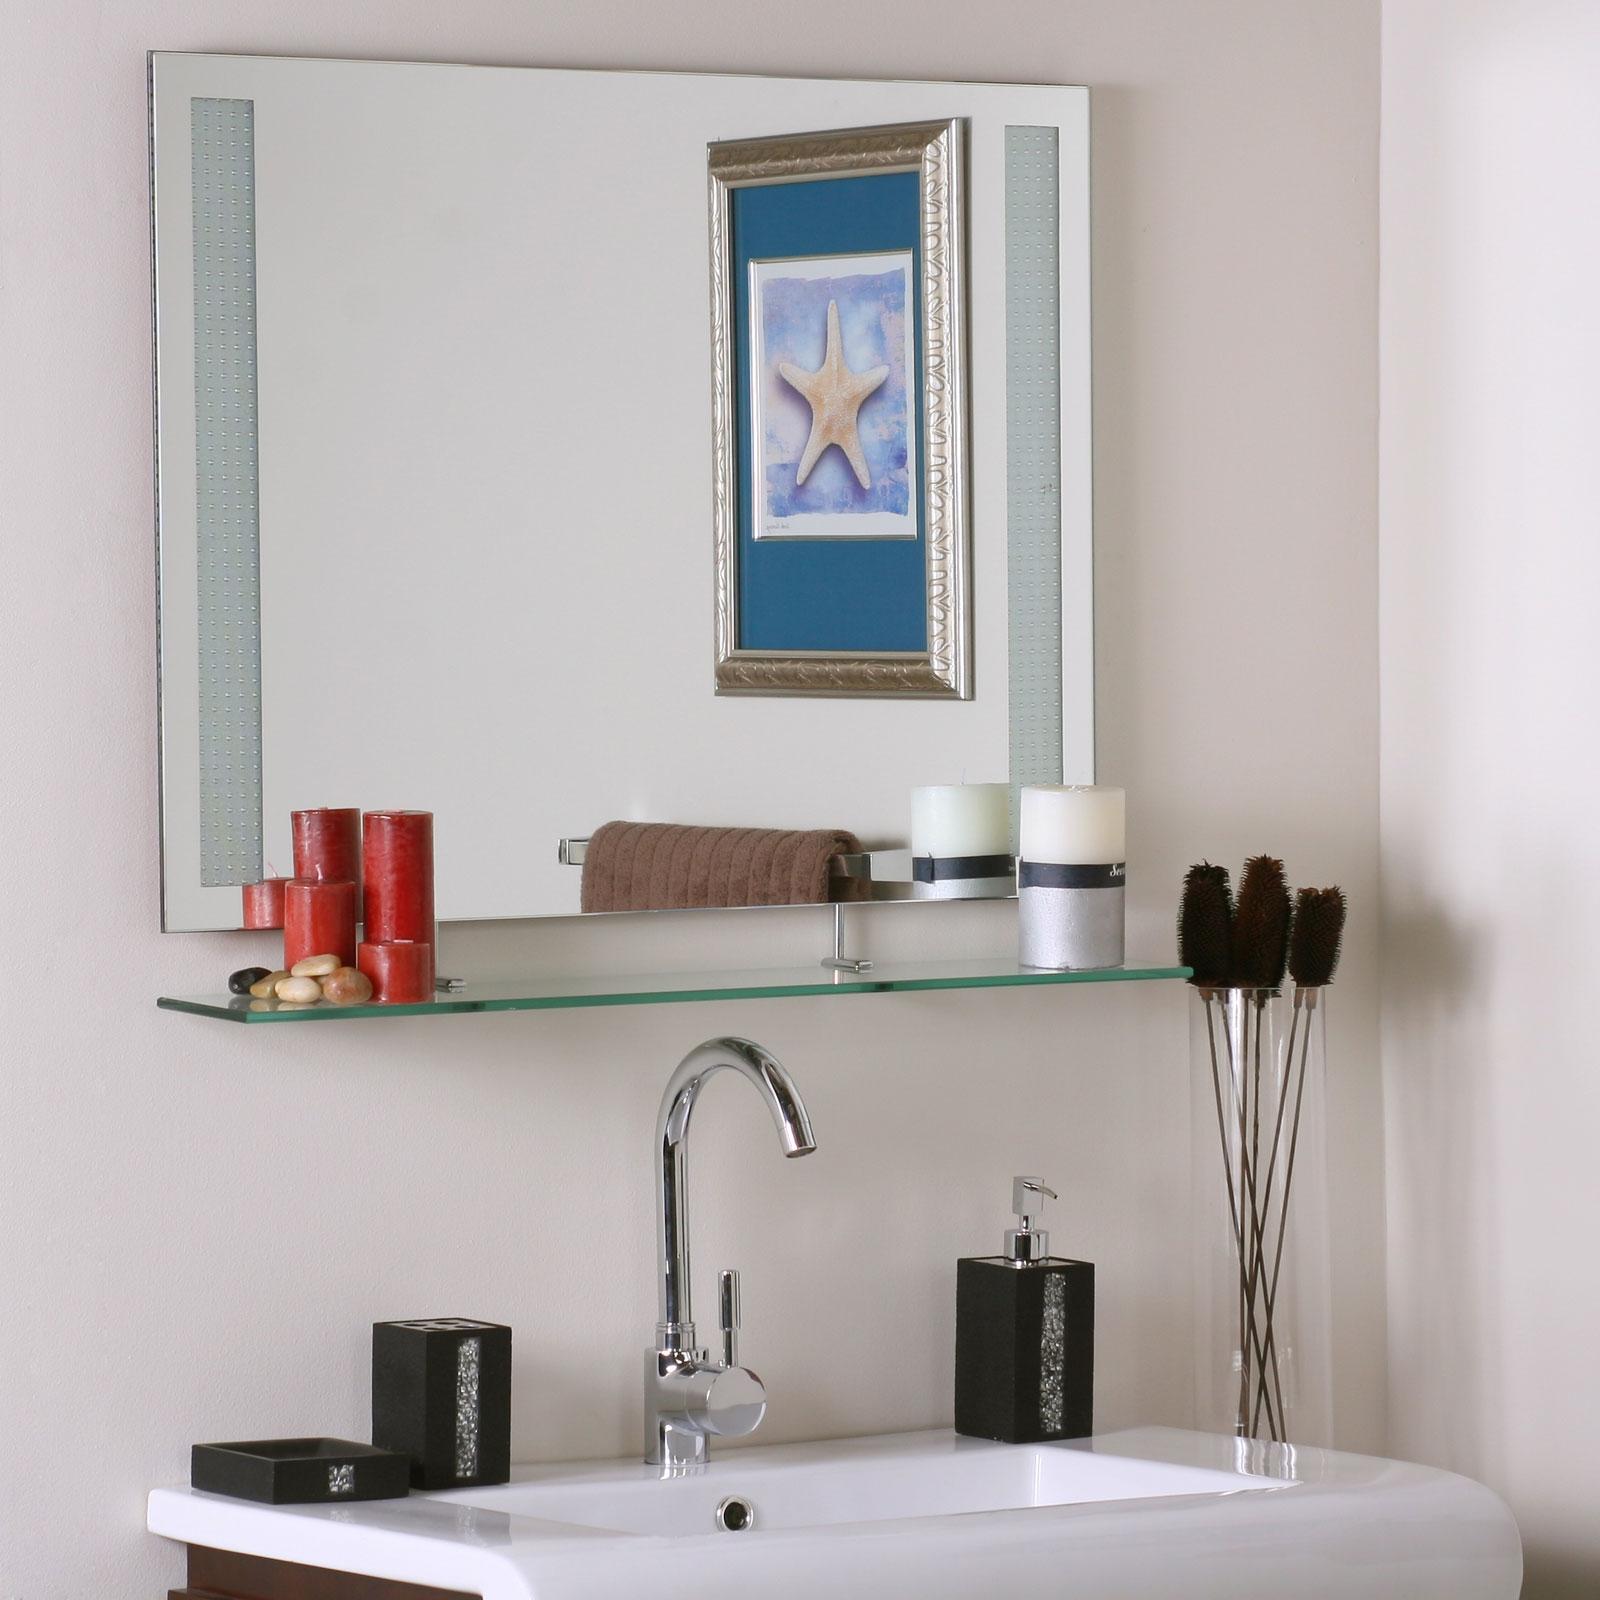 Bathroom Shelf Under Mirror